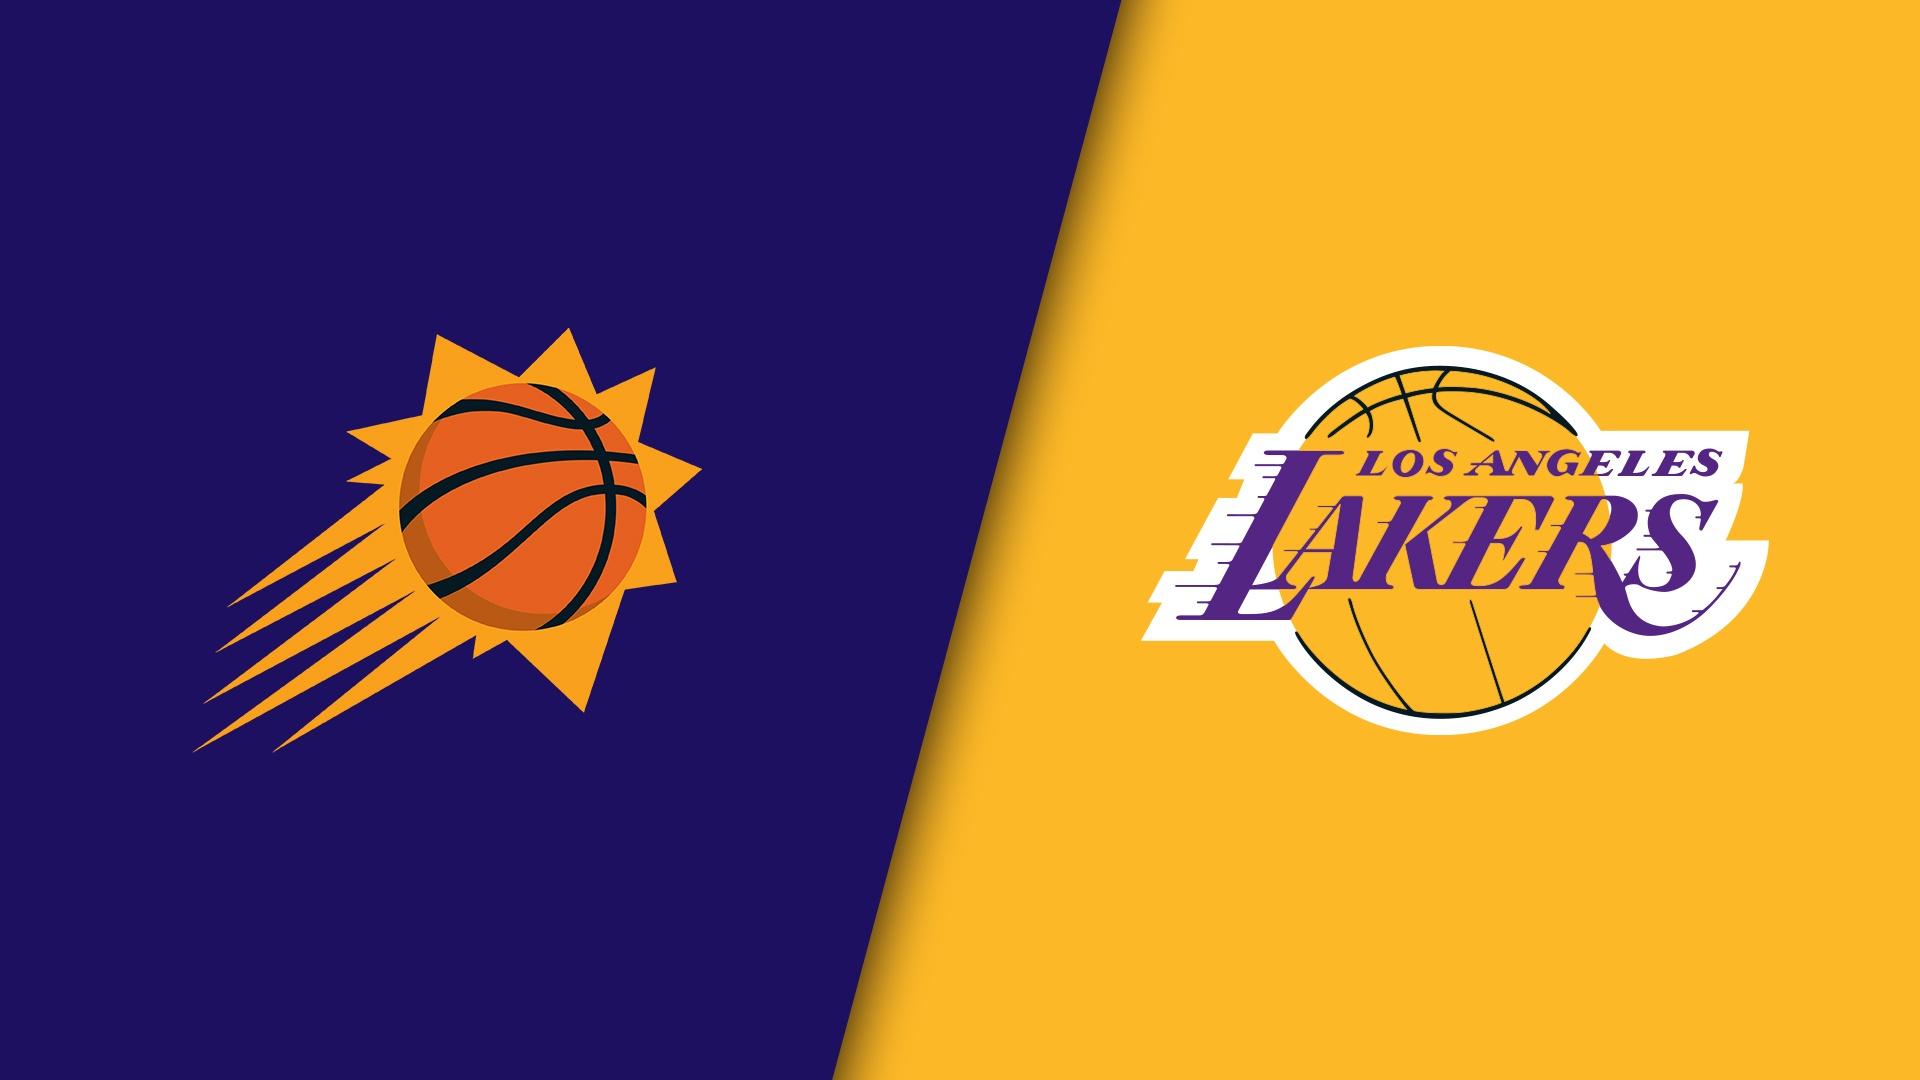 Phoenix Suns vs Los Angeles Lakers